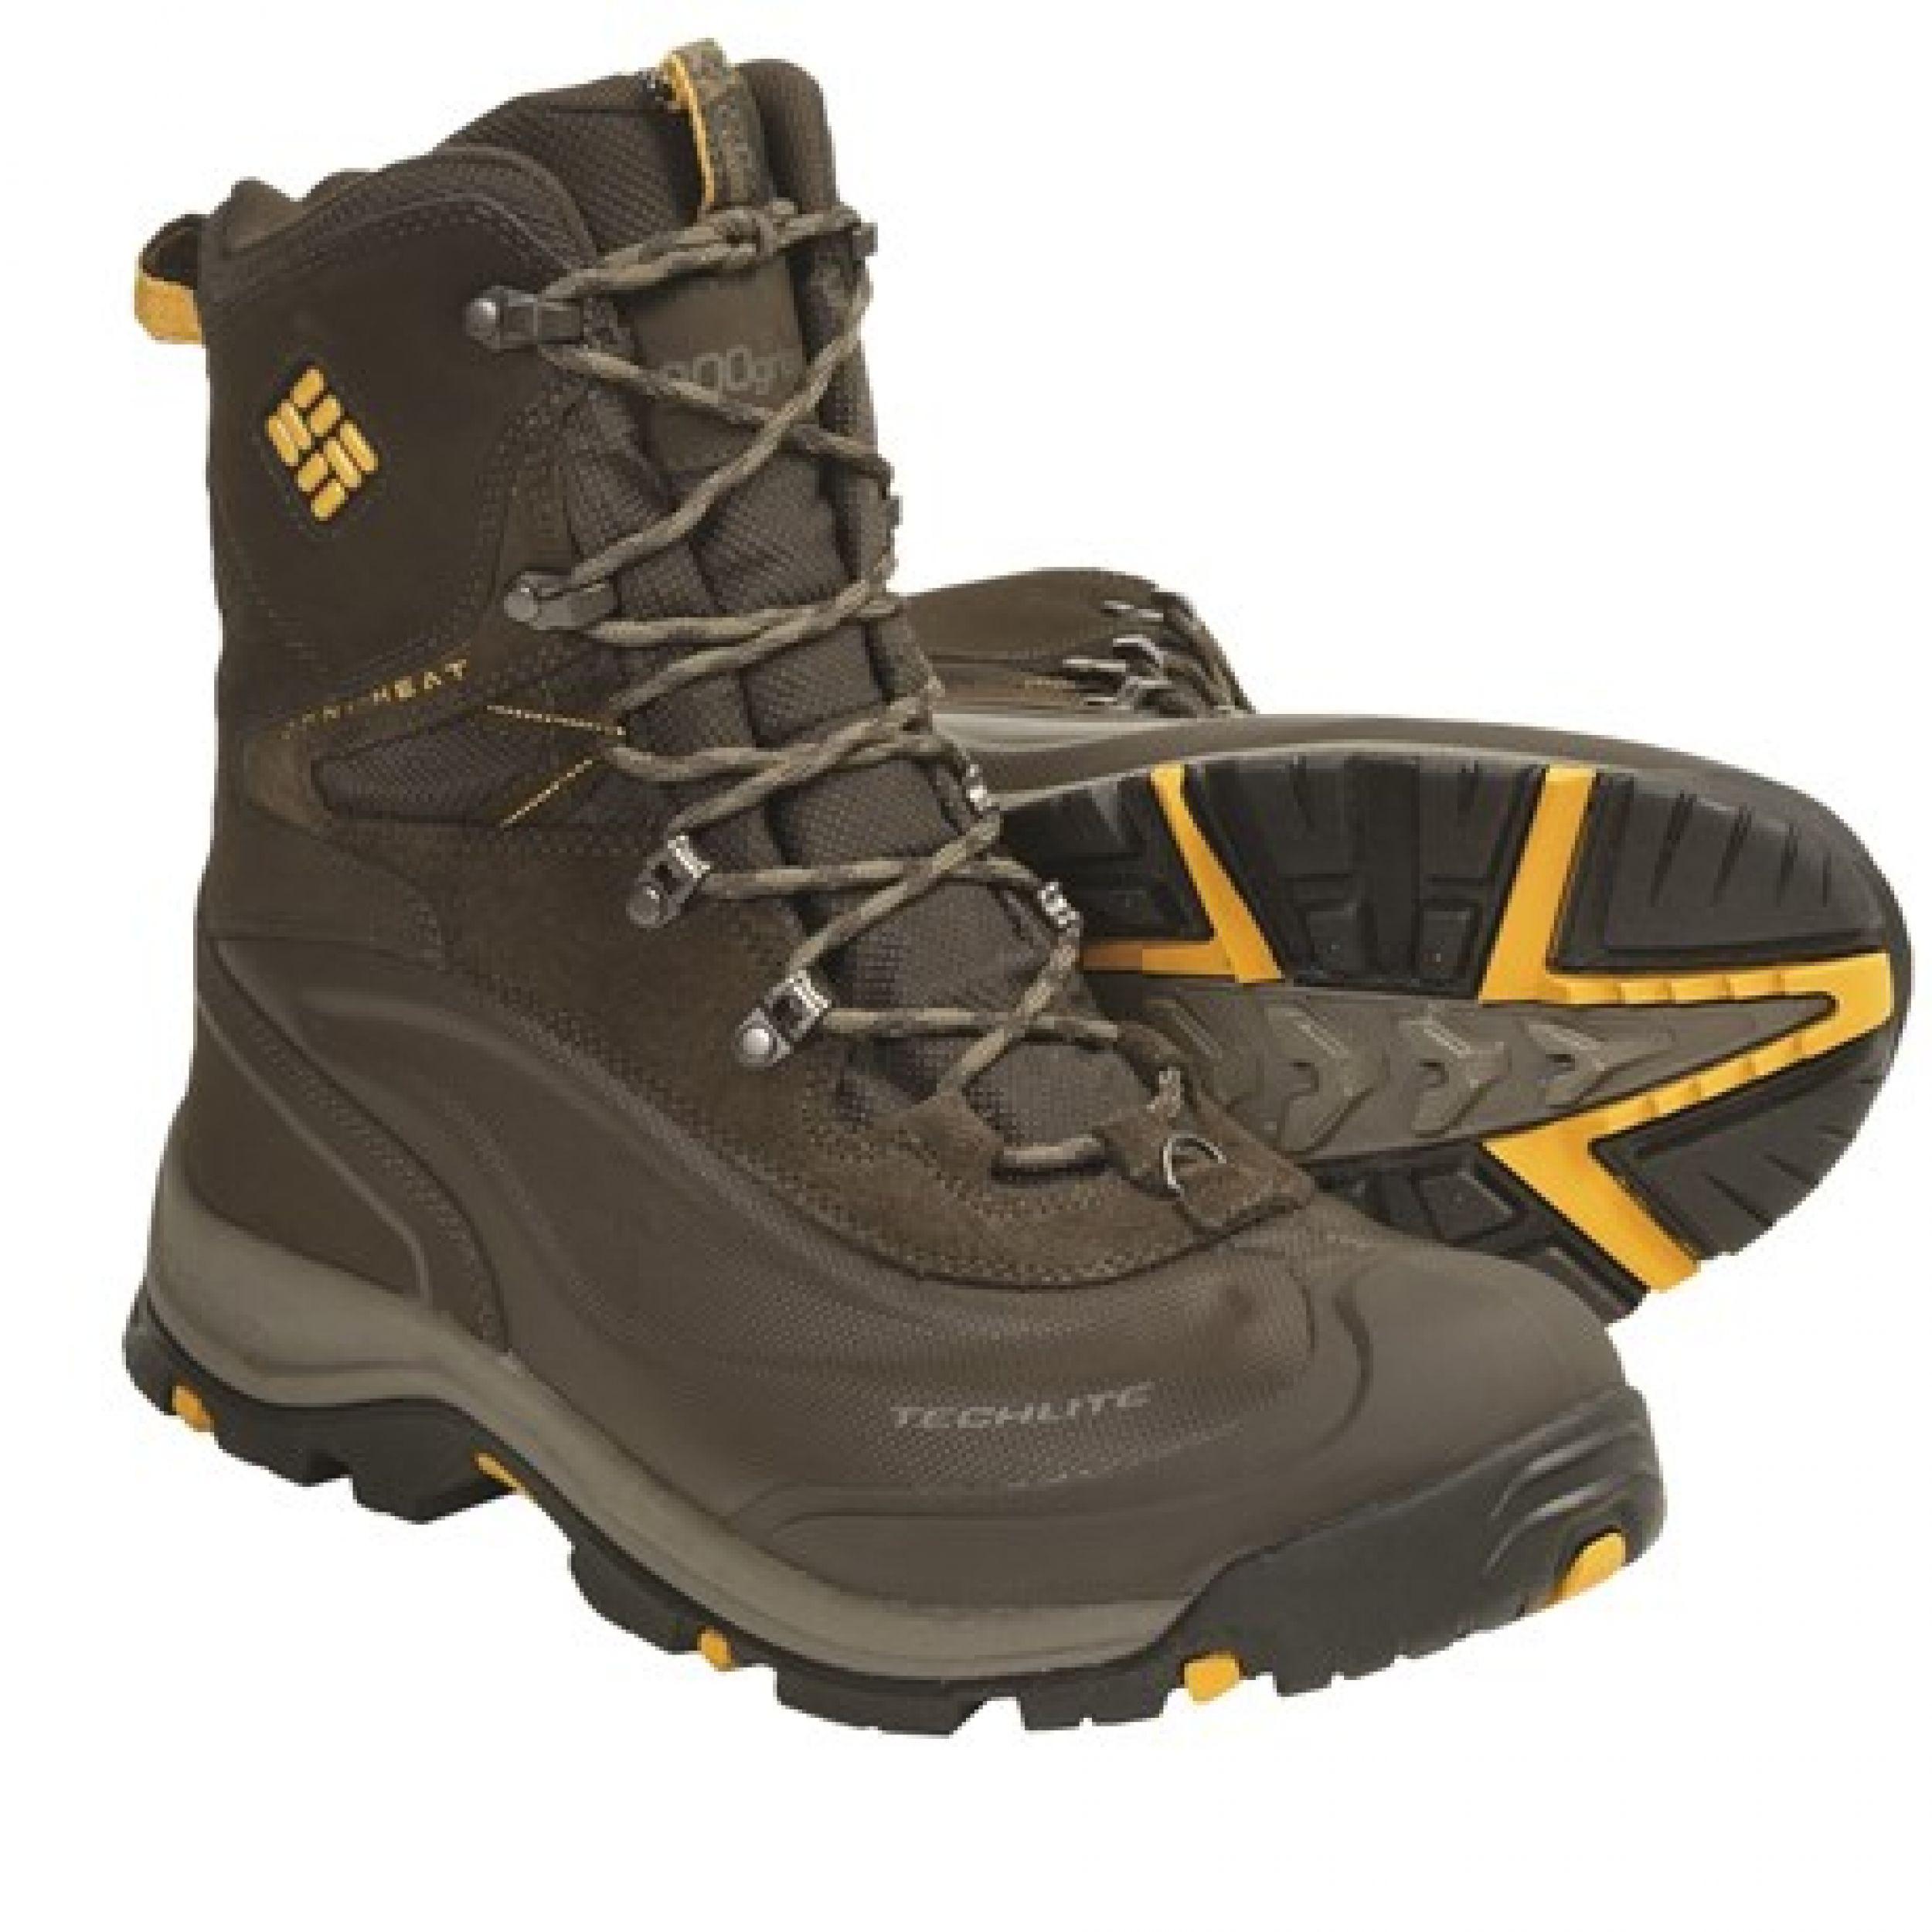 columbia-sportswear-bugaboot-plus-omni-heat-winter-boots-waterproof-for-men-in-grill-sanguinep4502k_05460.3.jpg